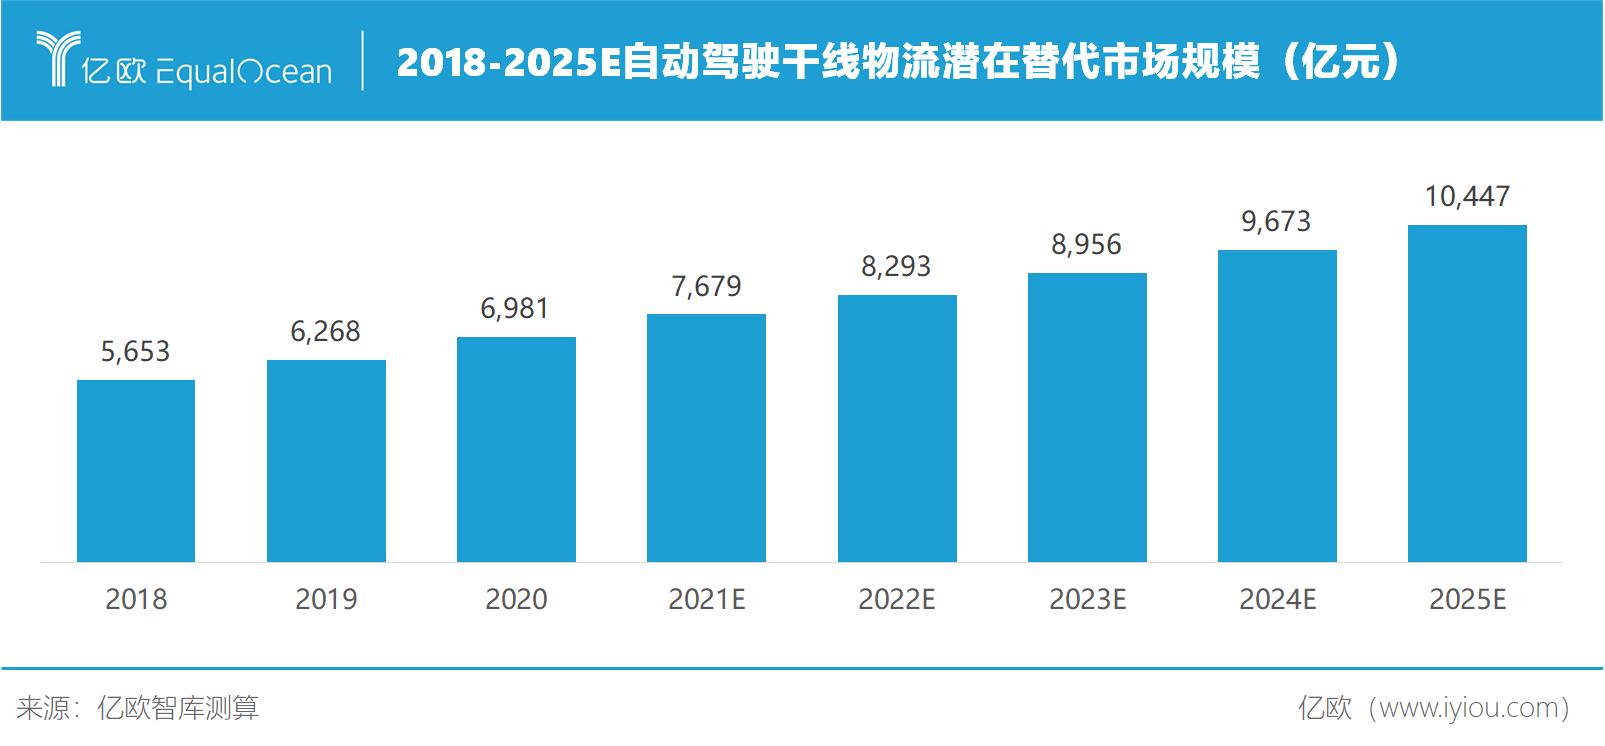 2018-2025E自动驾驶干线物流潜在替代市场规模